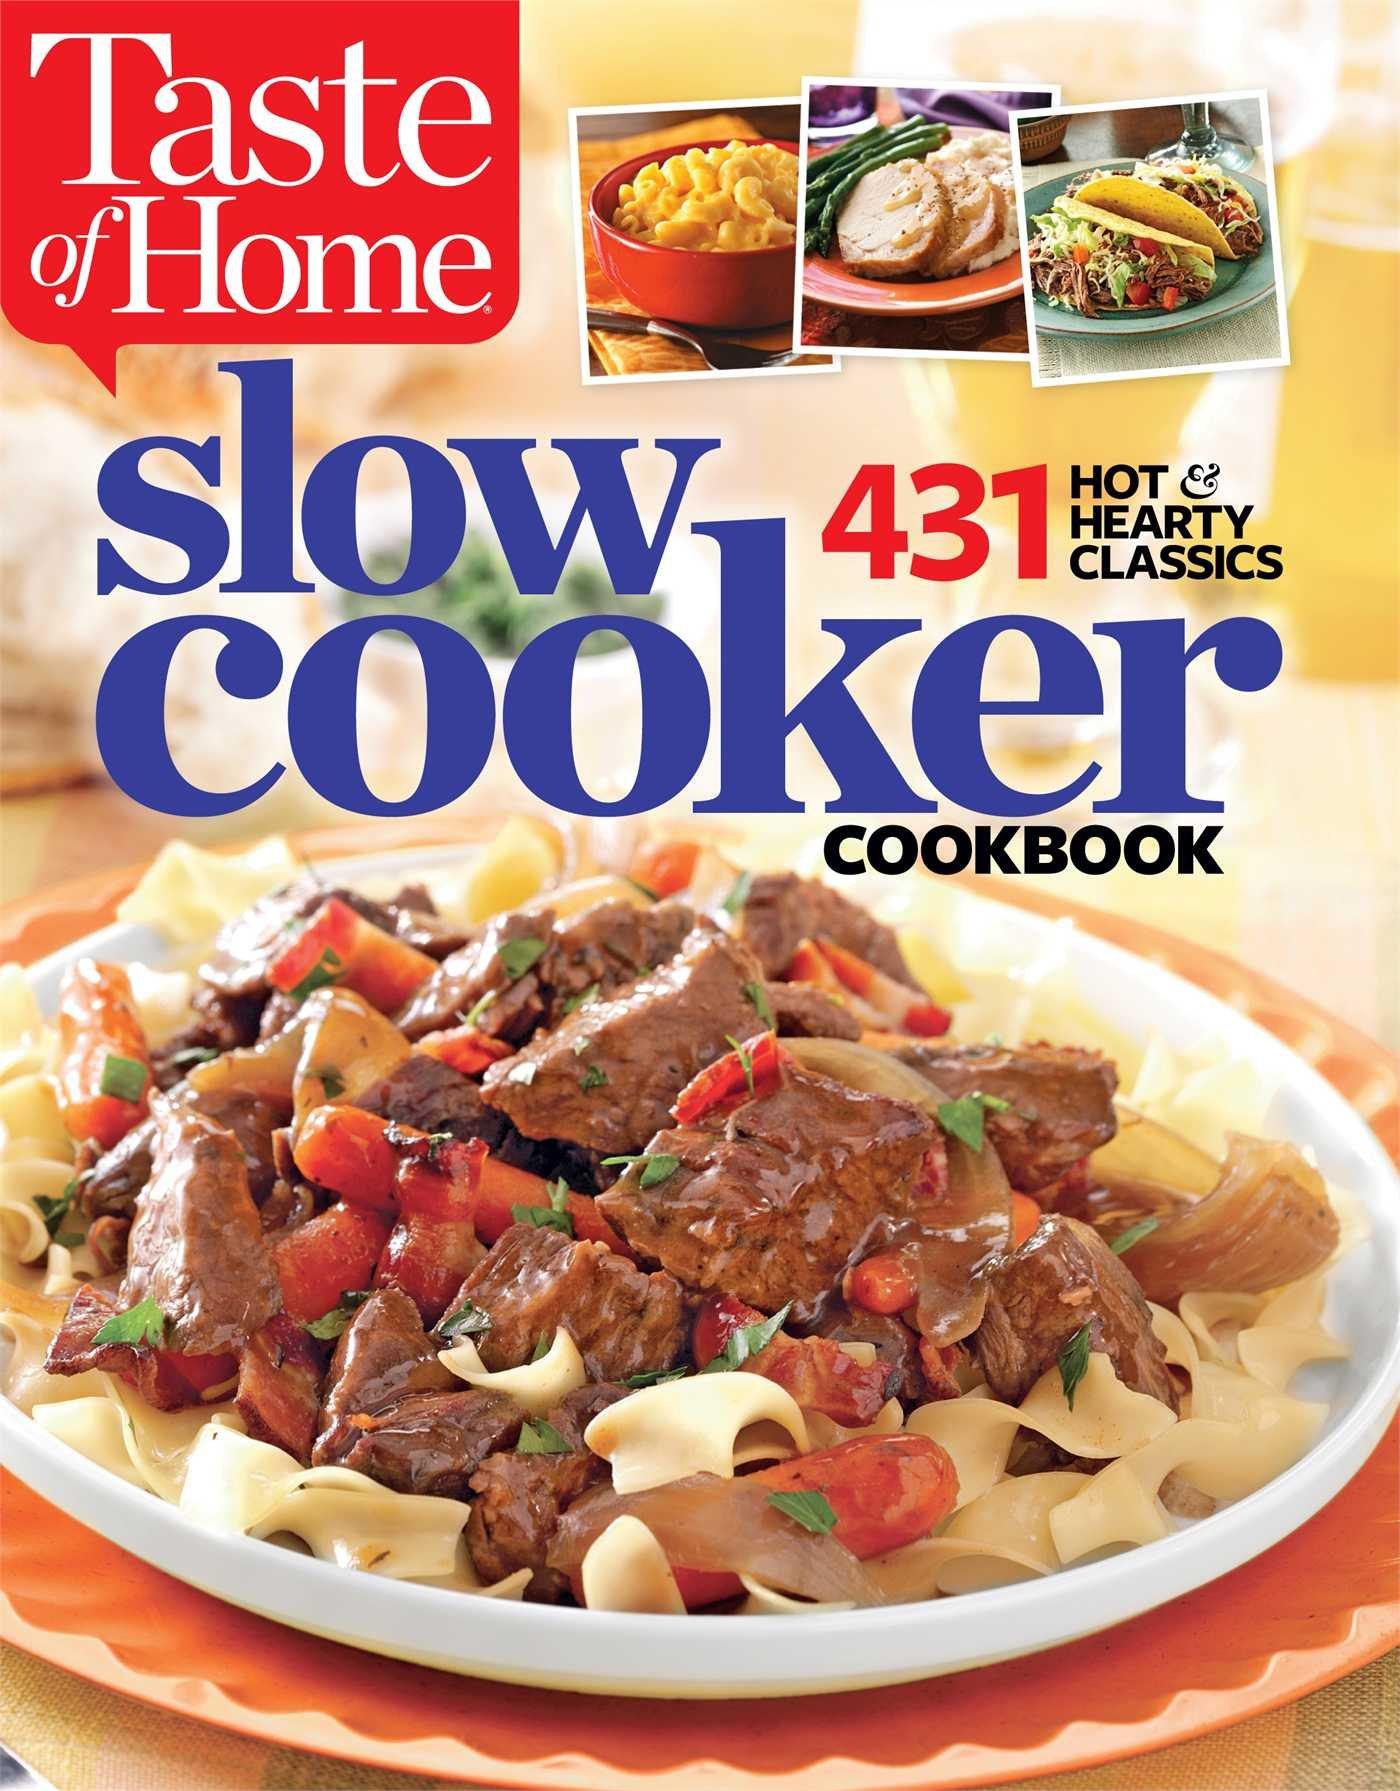 slowcookercookbook2